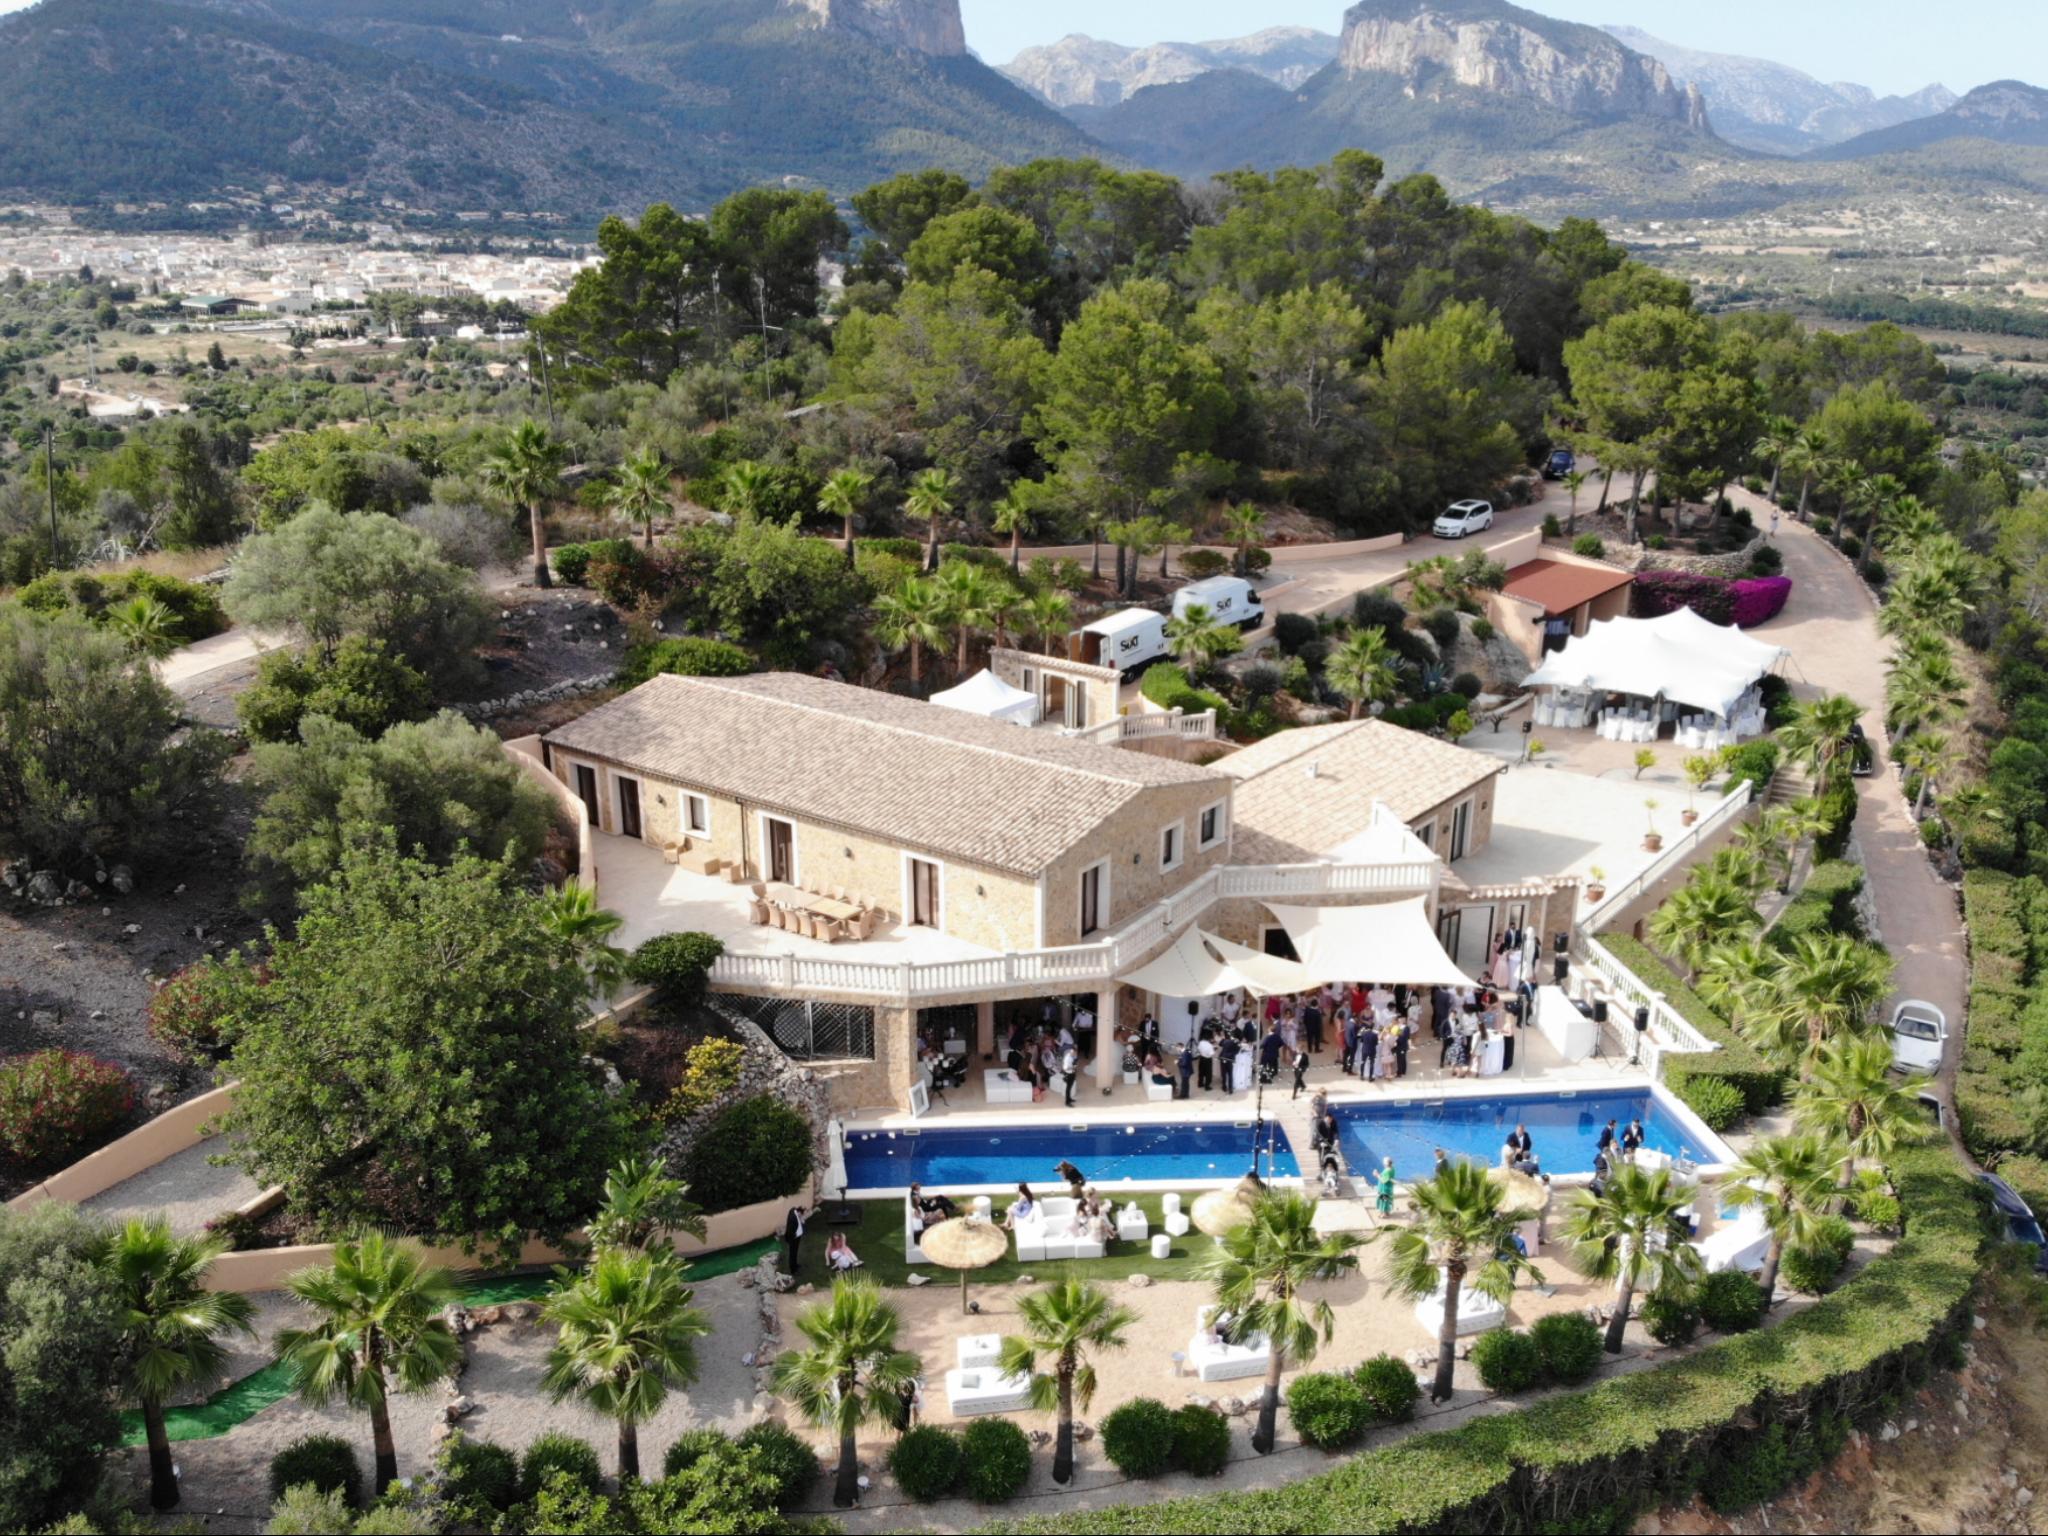 Neubau Naturstein-Finca mit spektakulärem Panoramablick in Alaro auf Mallorca zu verkaufen